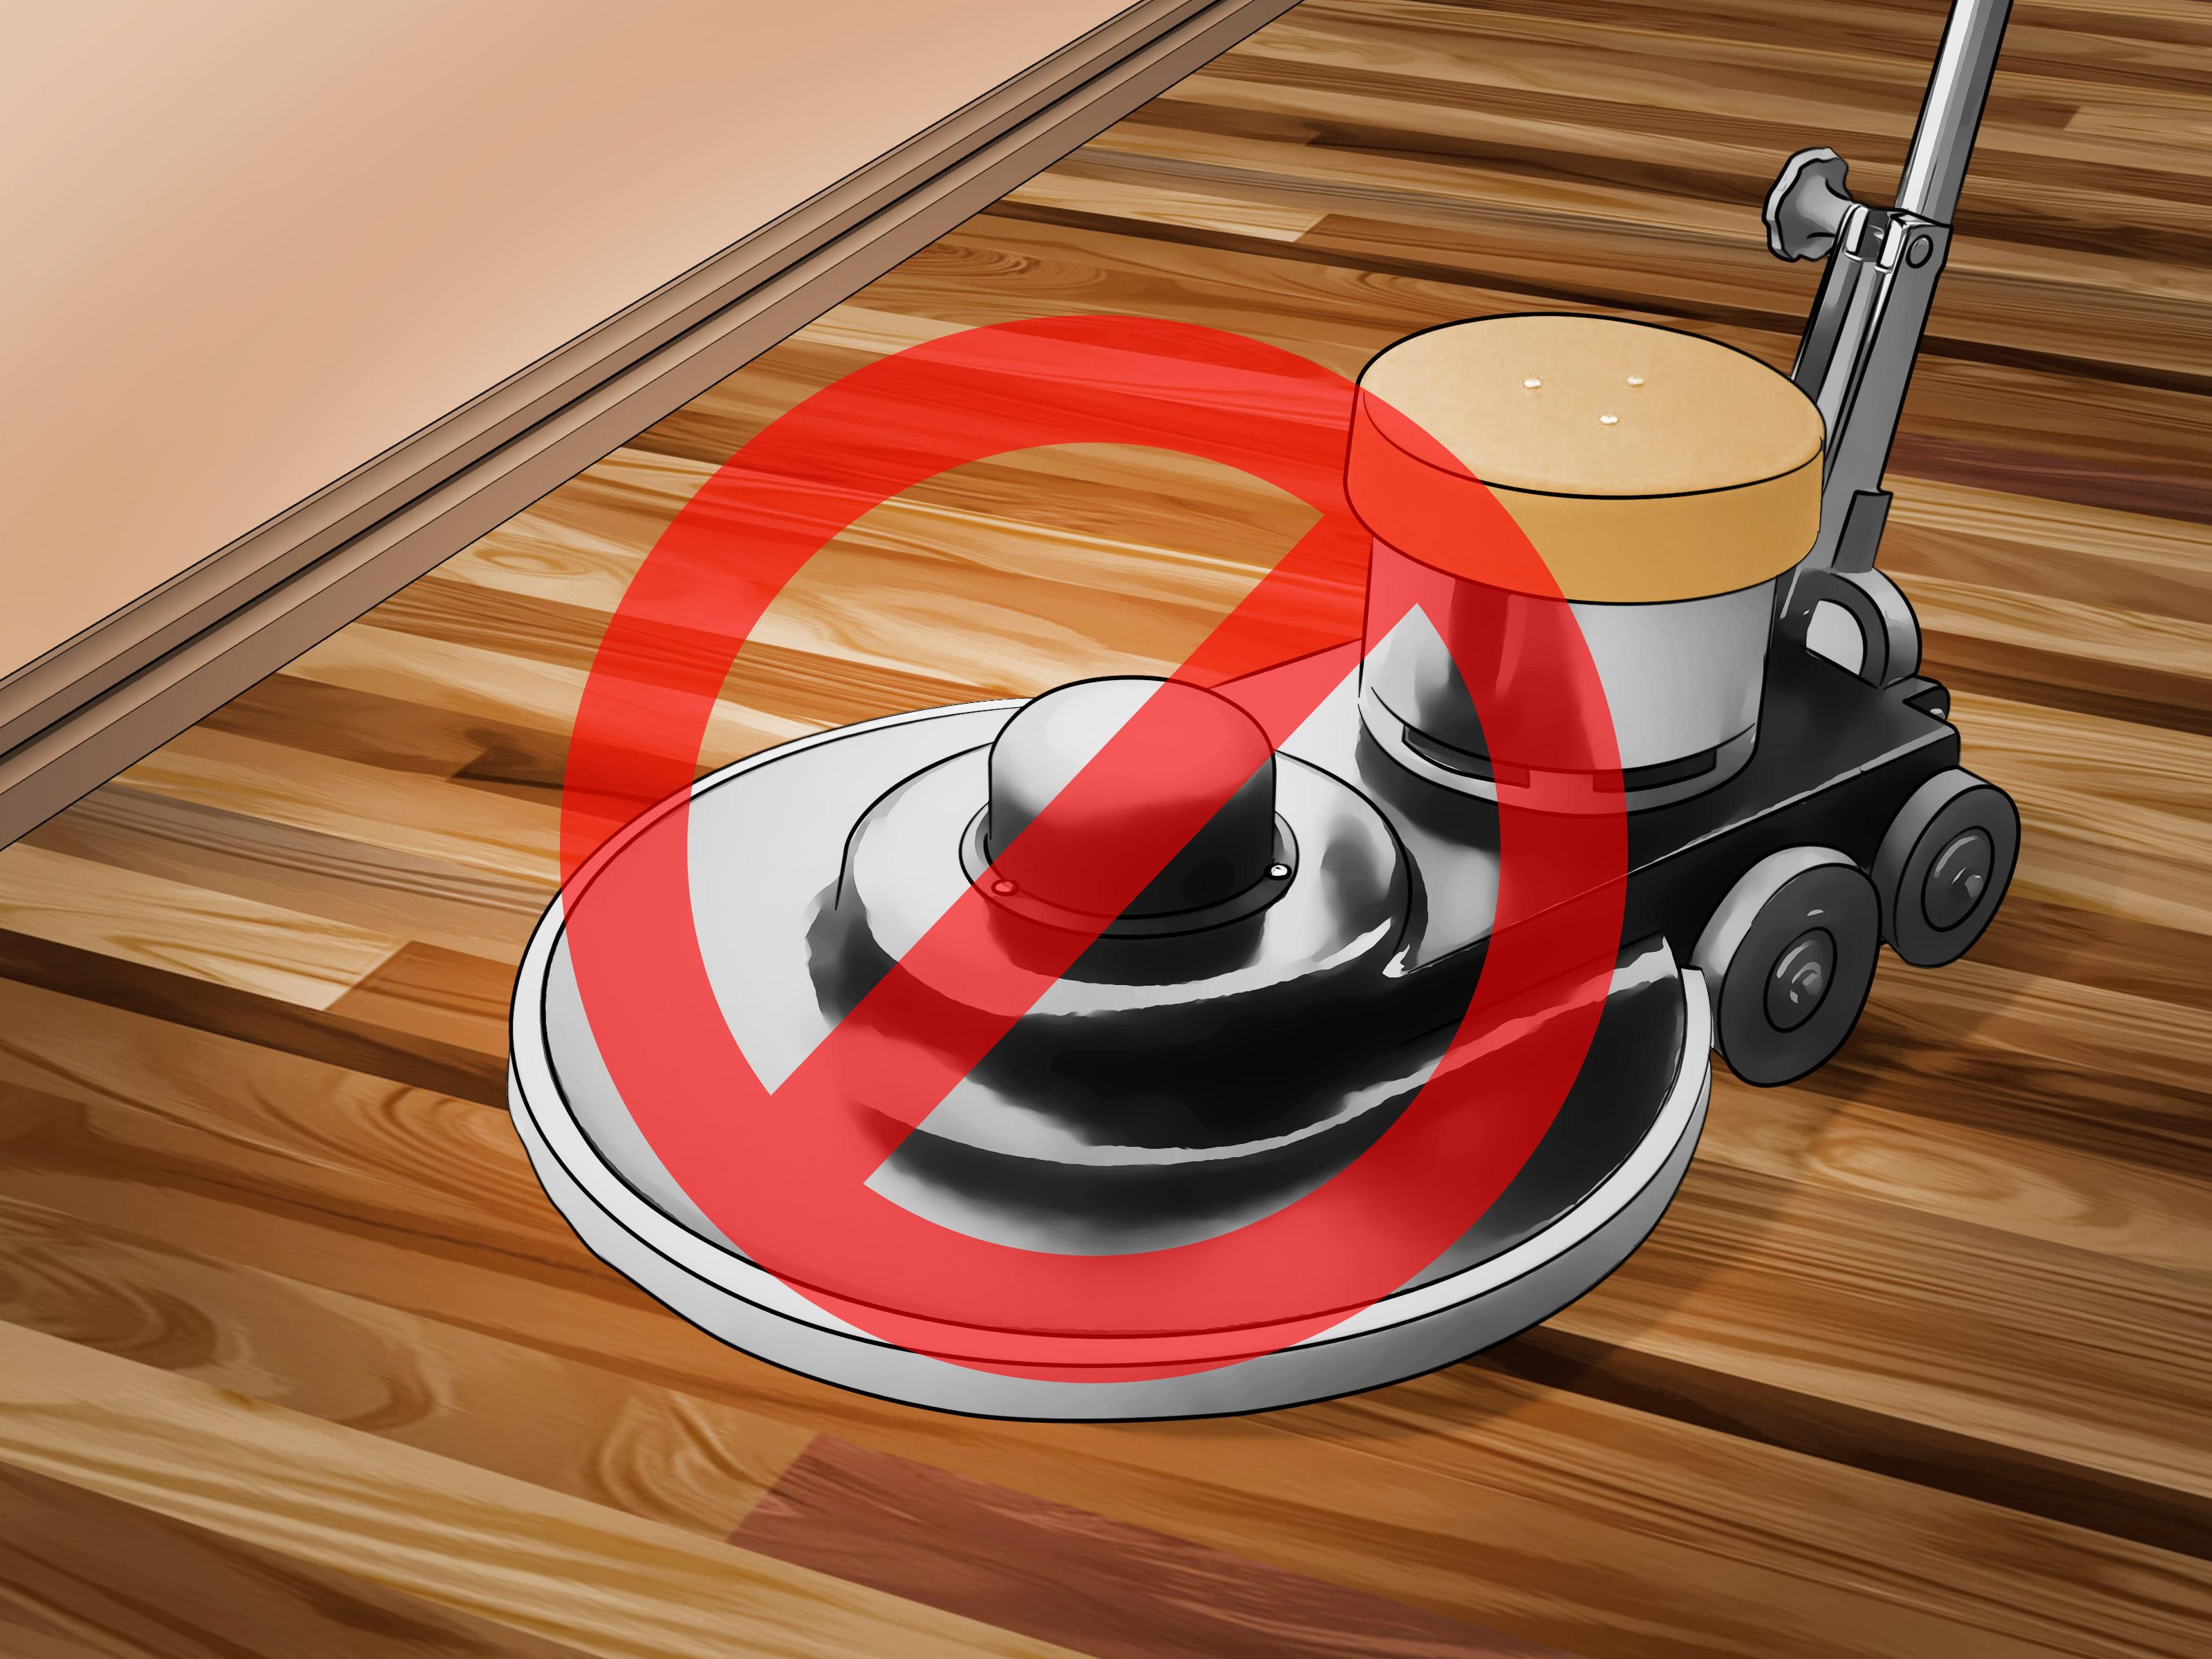 best diy cleaner for hardwood floors of 4 ways to clean polyurethane wood floors wikihow throughout clean polyurethane wood floors step 15